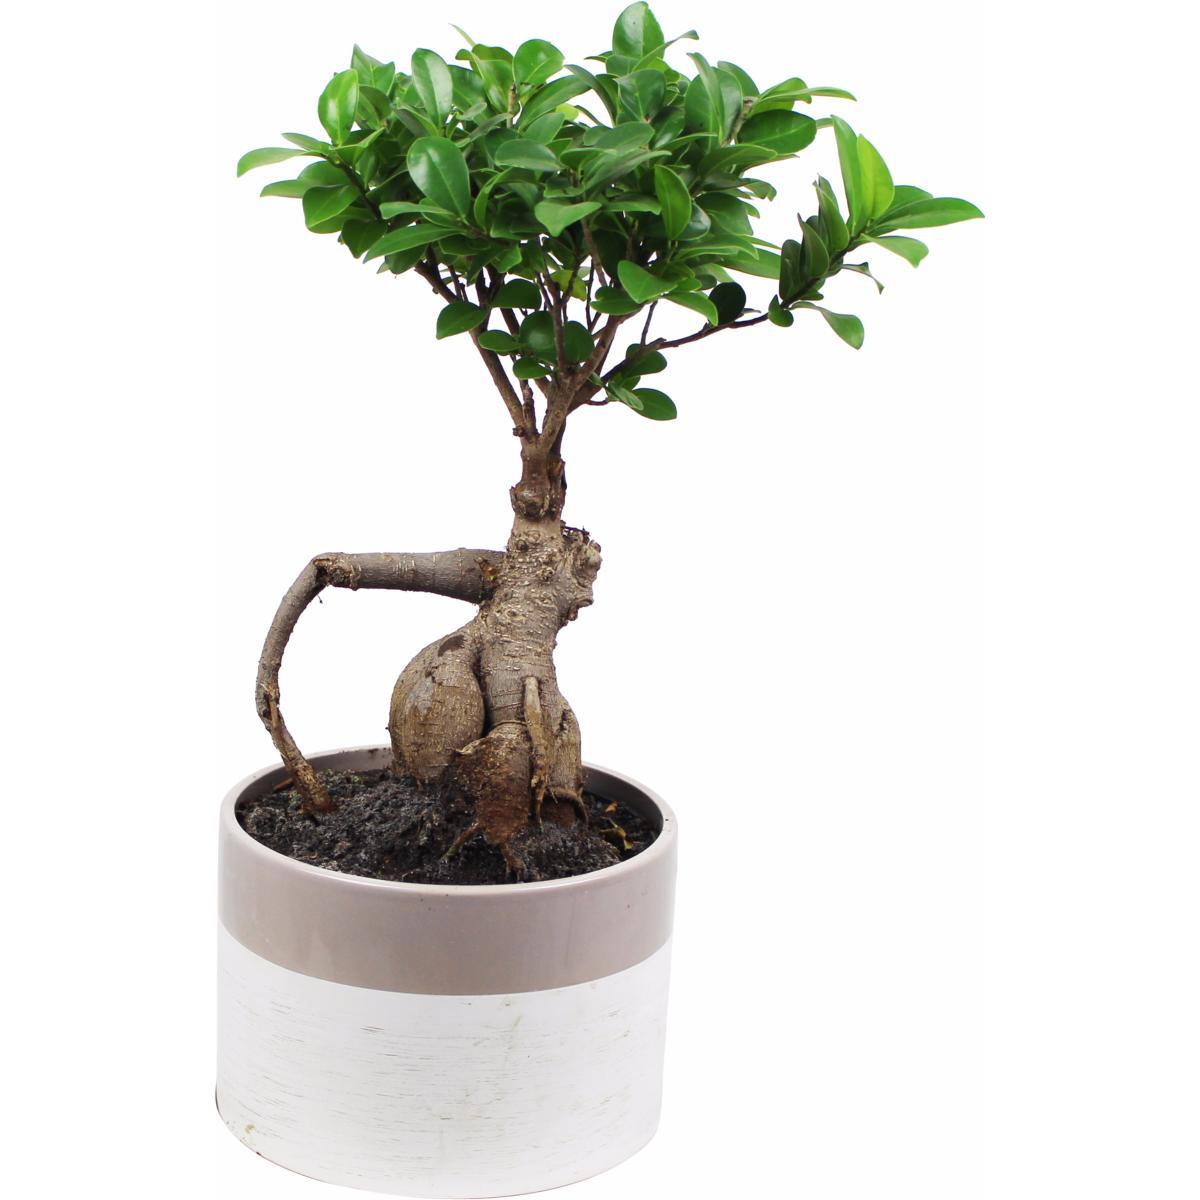 La fontaine fleurie bonsai ficus ginseng cleo - Bonsai ficus ginseng entretien ...